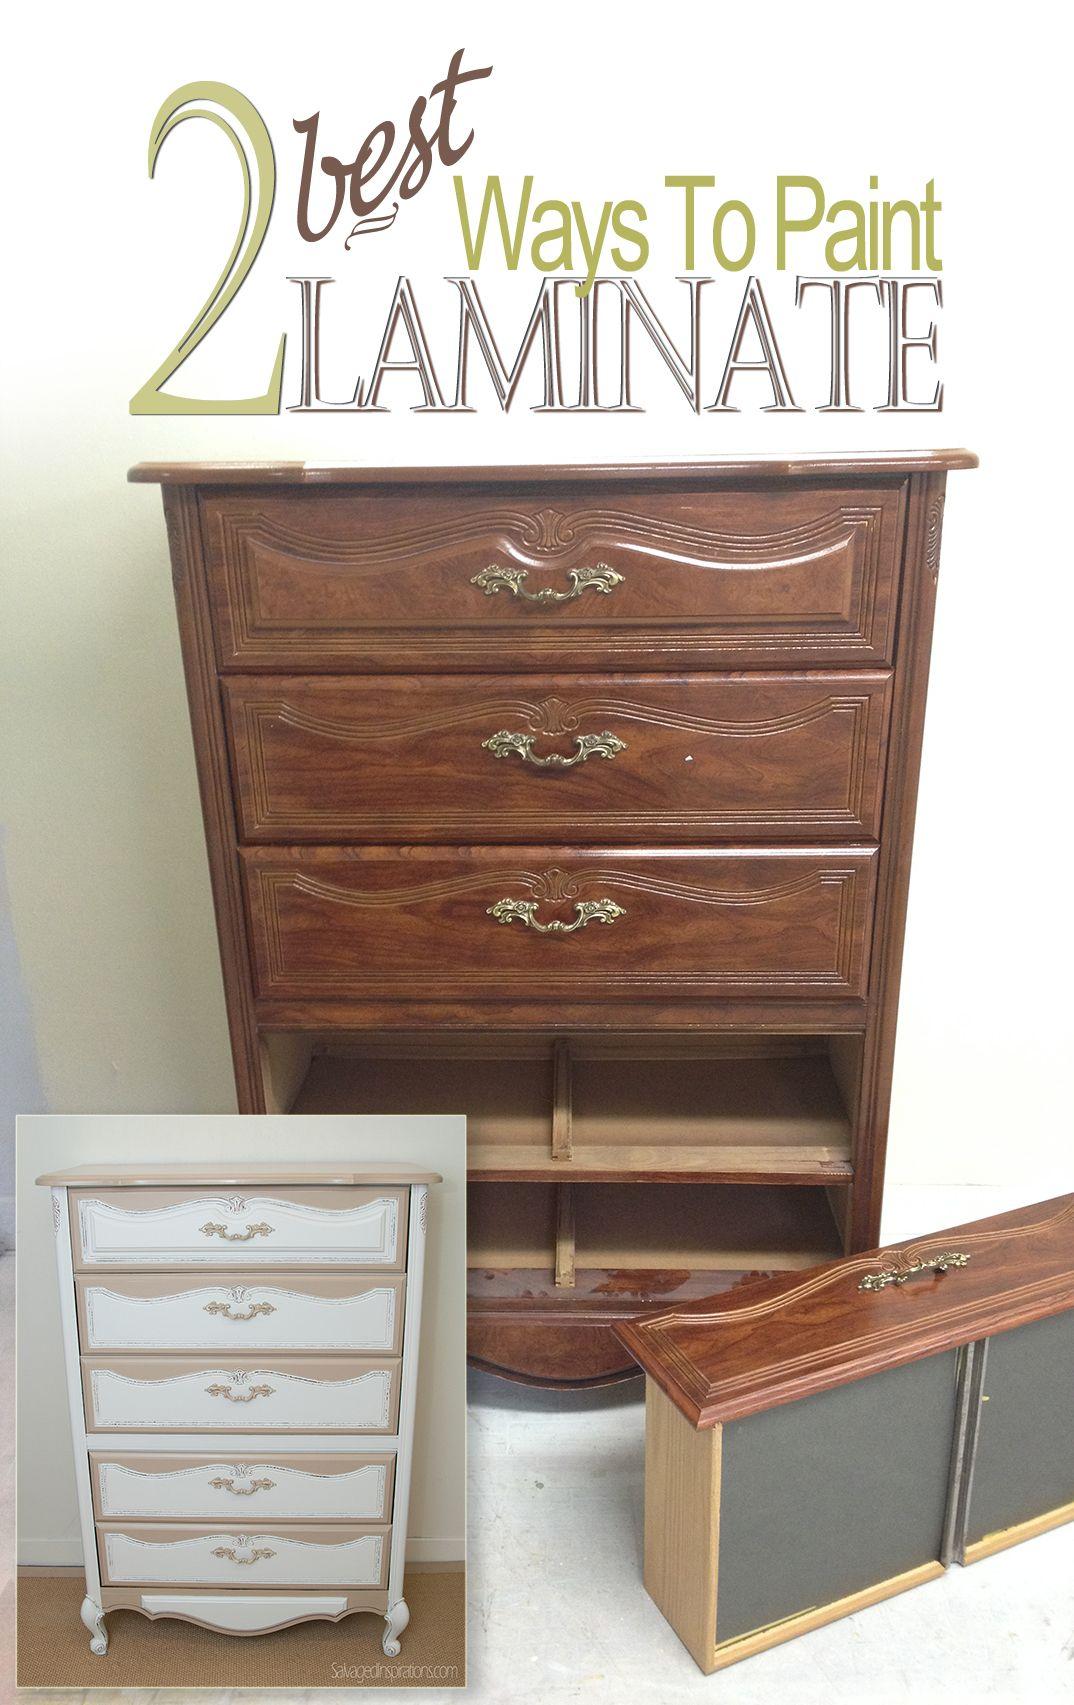 2 Best Ways To Paint Laminate Furniture Painting Laminate Furniture Laminate Furniture Painting Laminate Dresser